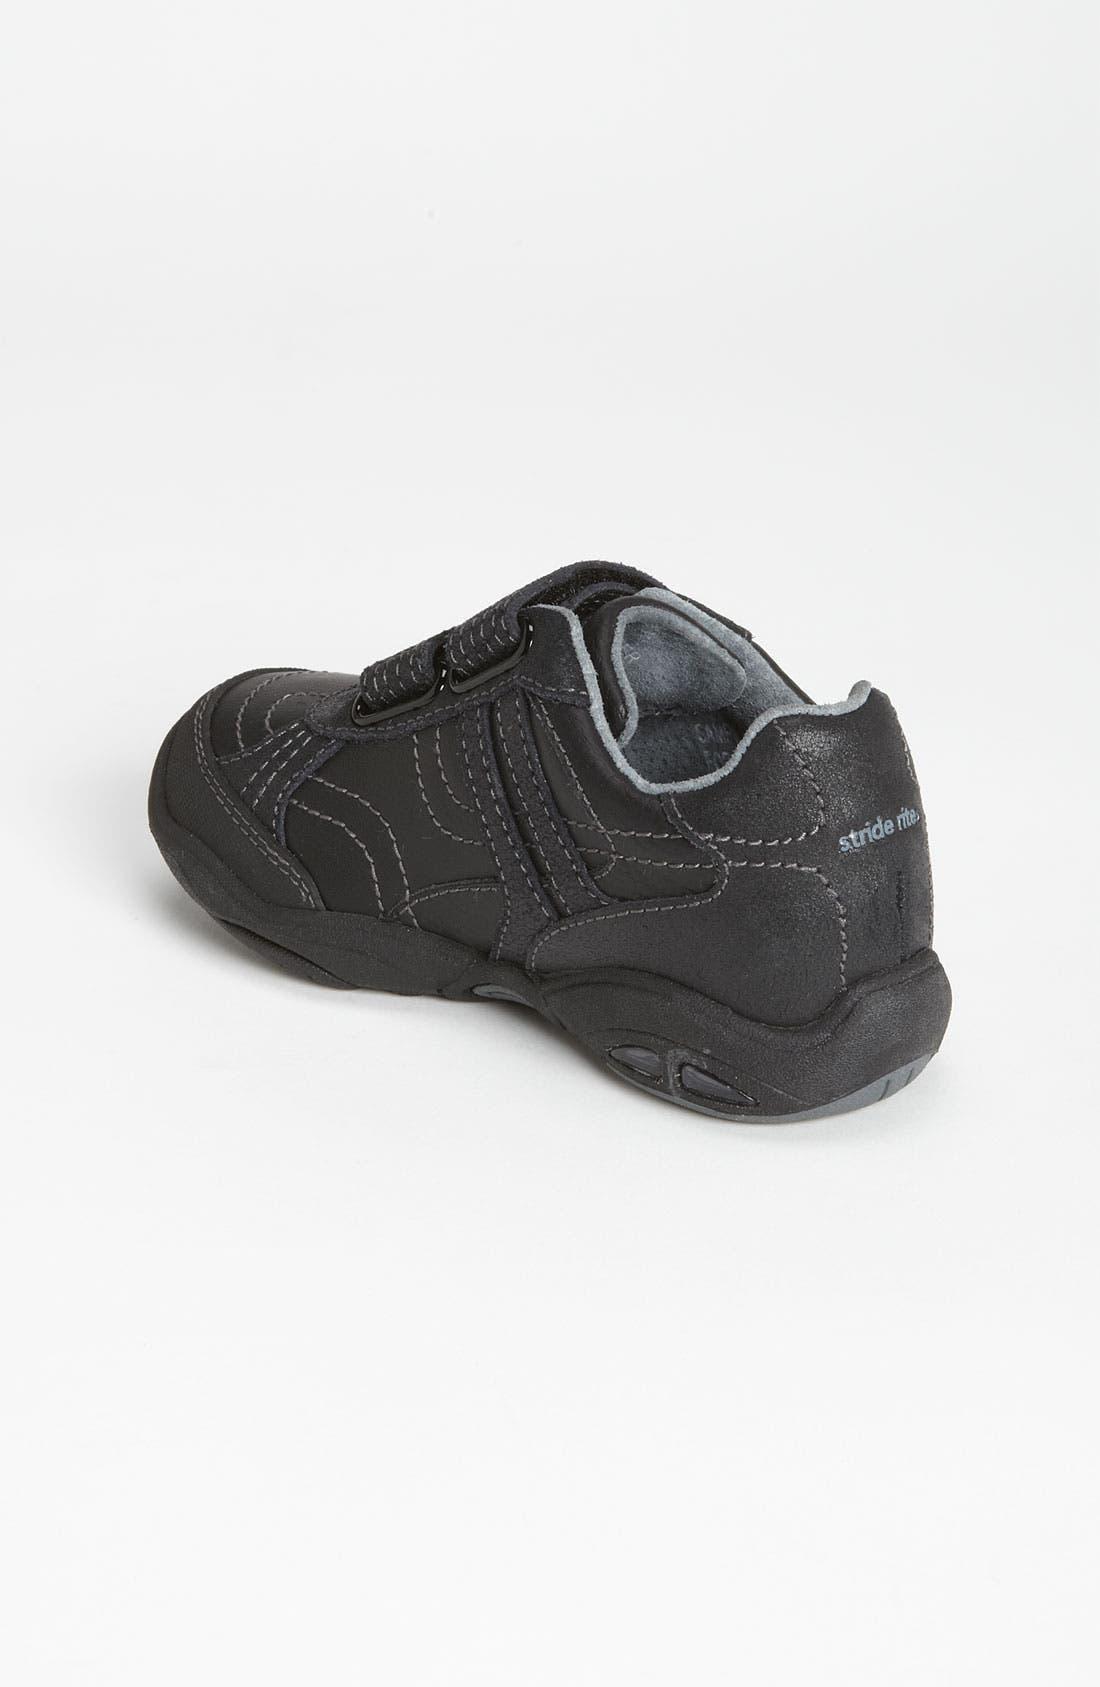 Alternate Image 2  - Stride Rite 'Baxter' Sneaker (Toddler & Little Kid)